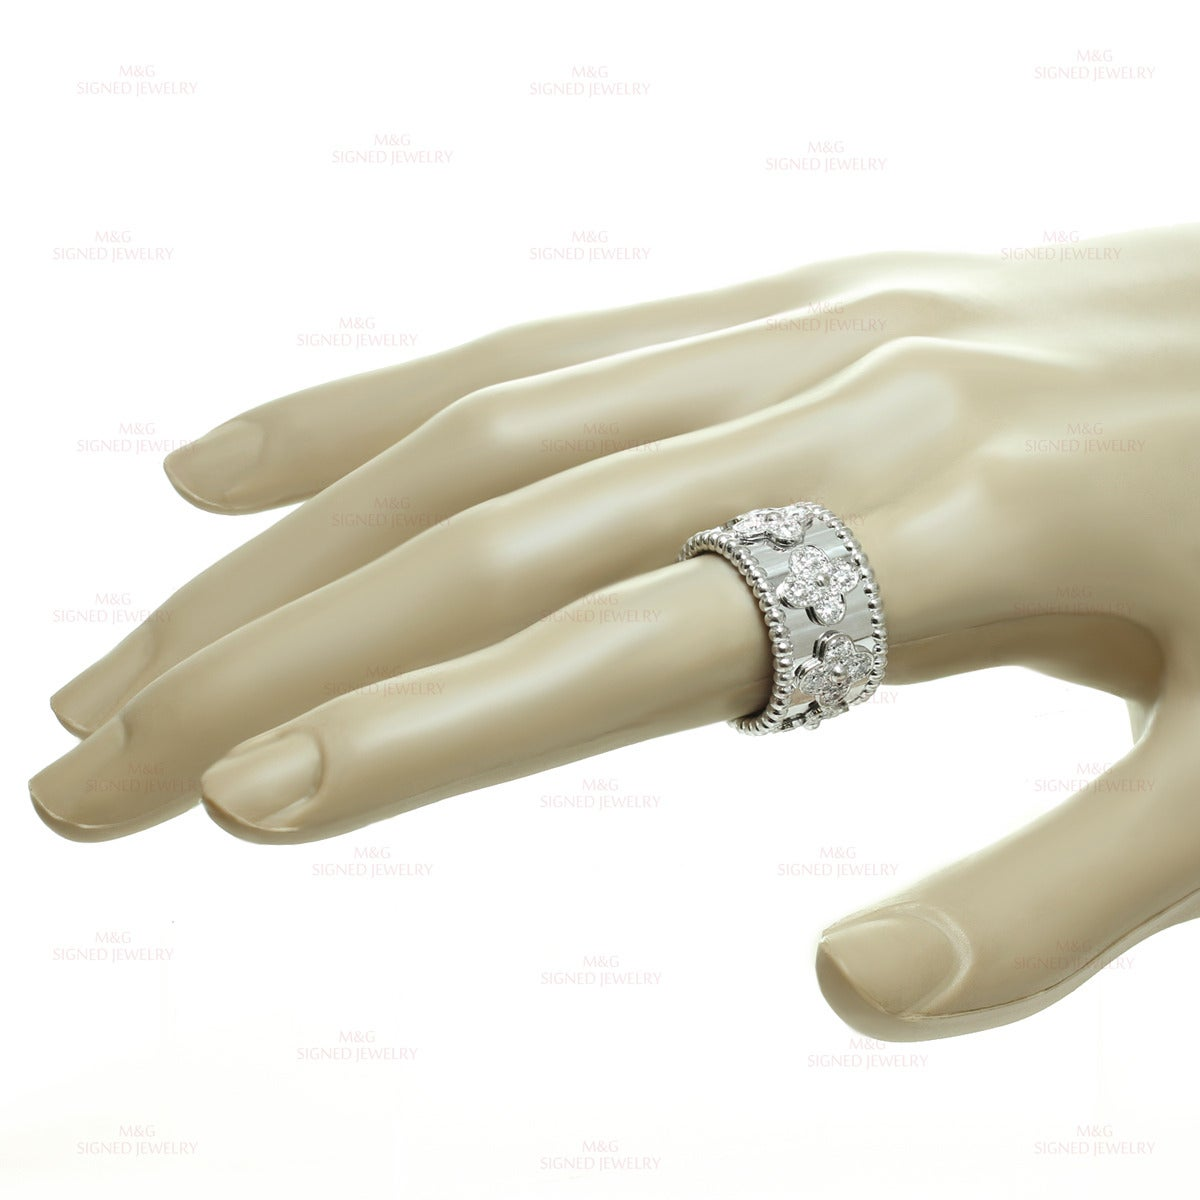 Van Cleef & Arpels Perlee Clover Diamond Gold Band Ring 4